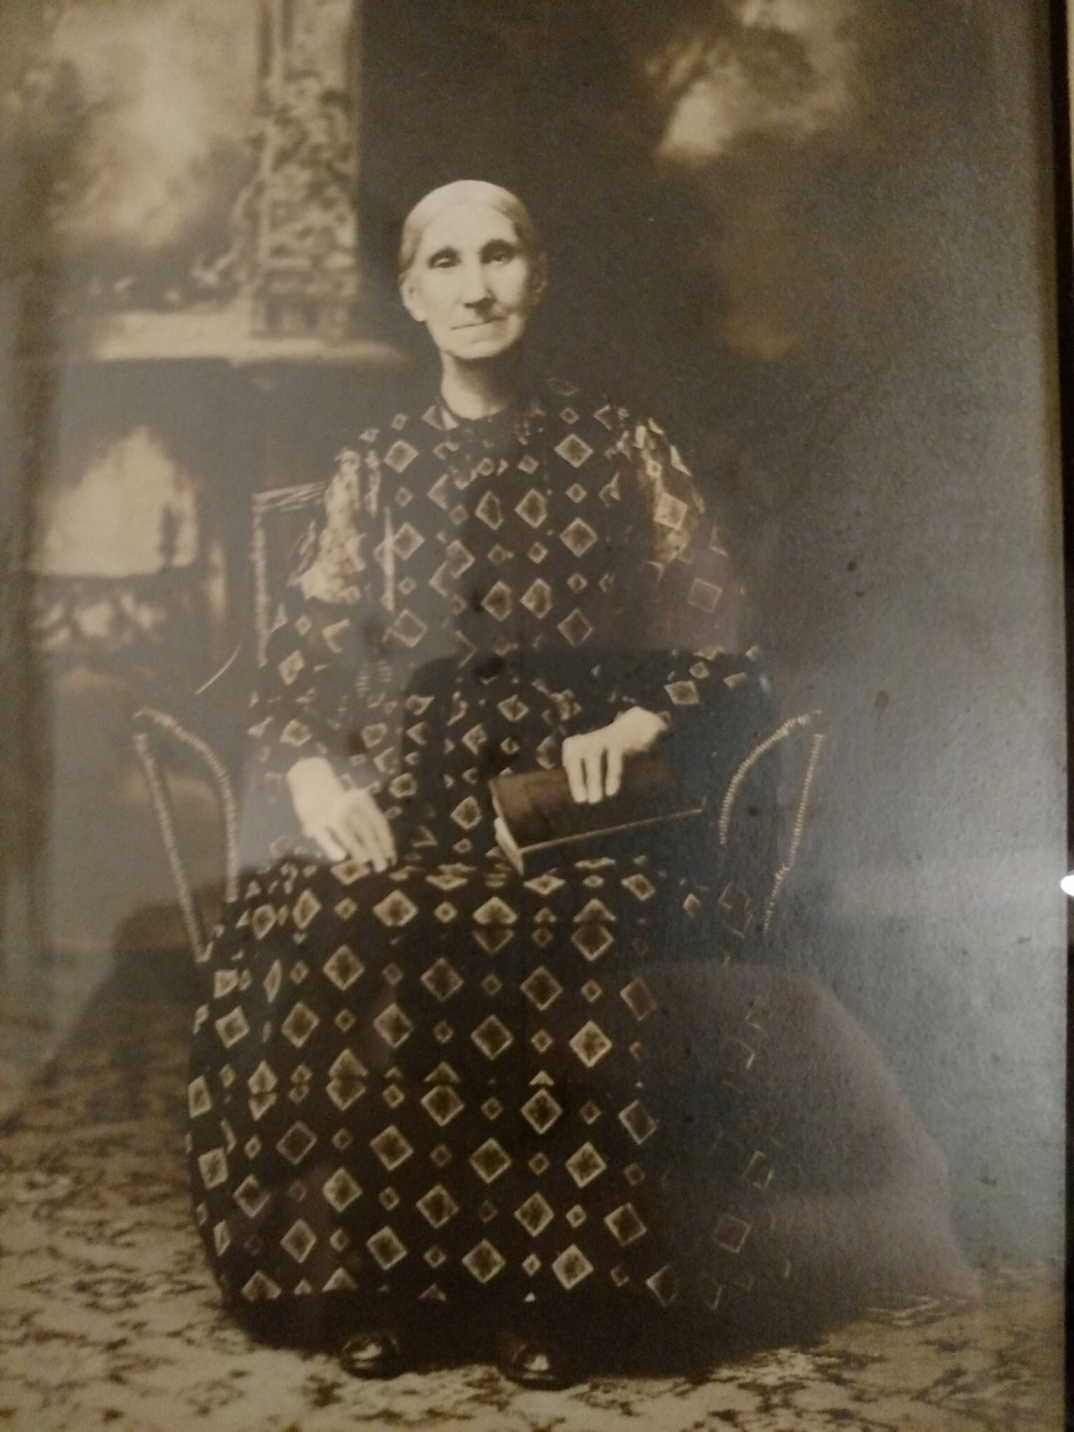 Helen's grandmother (my 2nd great grandmother)Marie Zuchowska Pawlowski (1851-??)